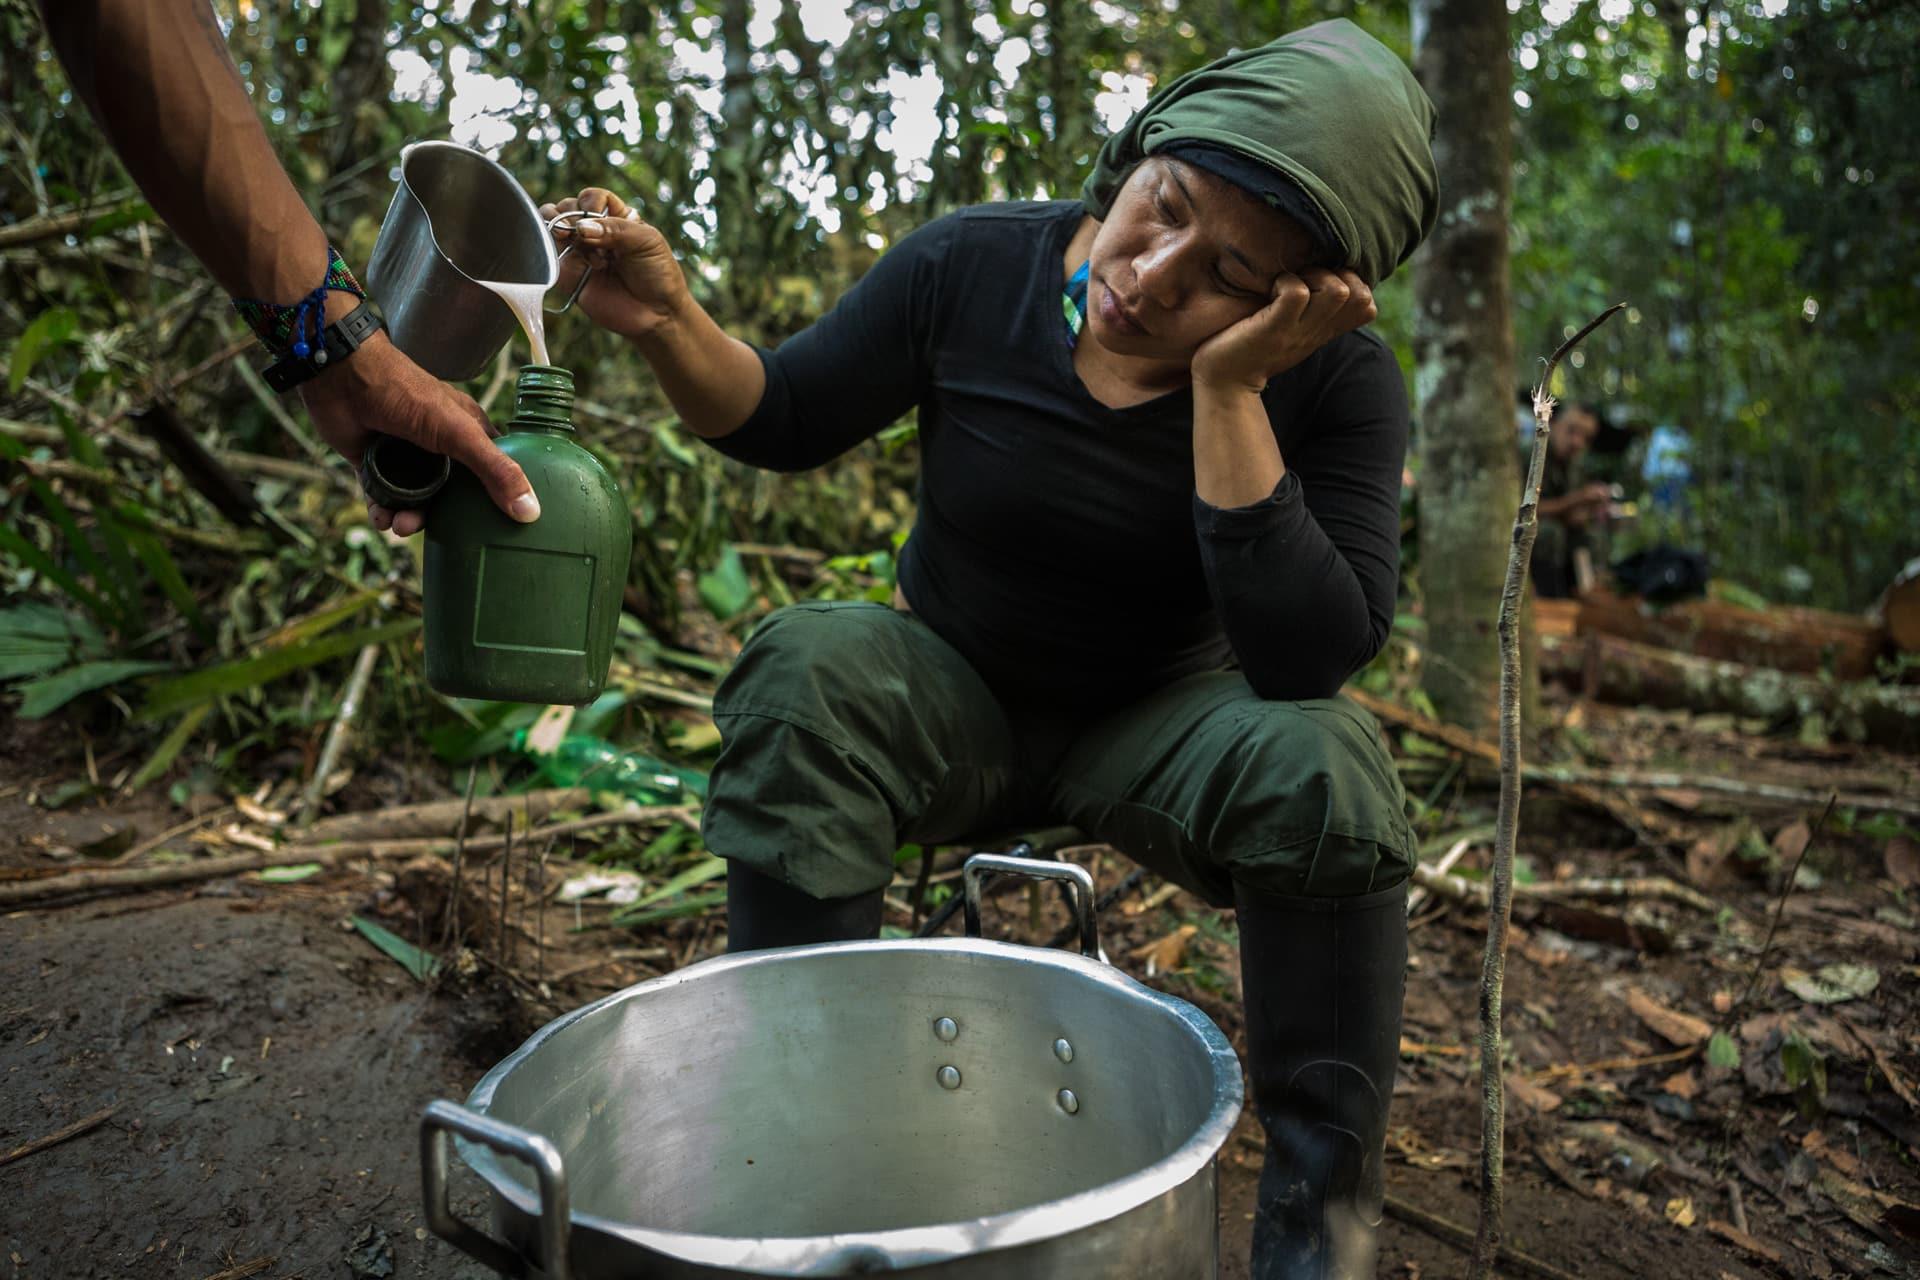 Arredondo_Juan_Photojournalism_FARC_017